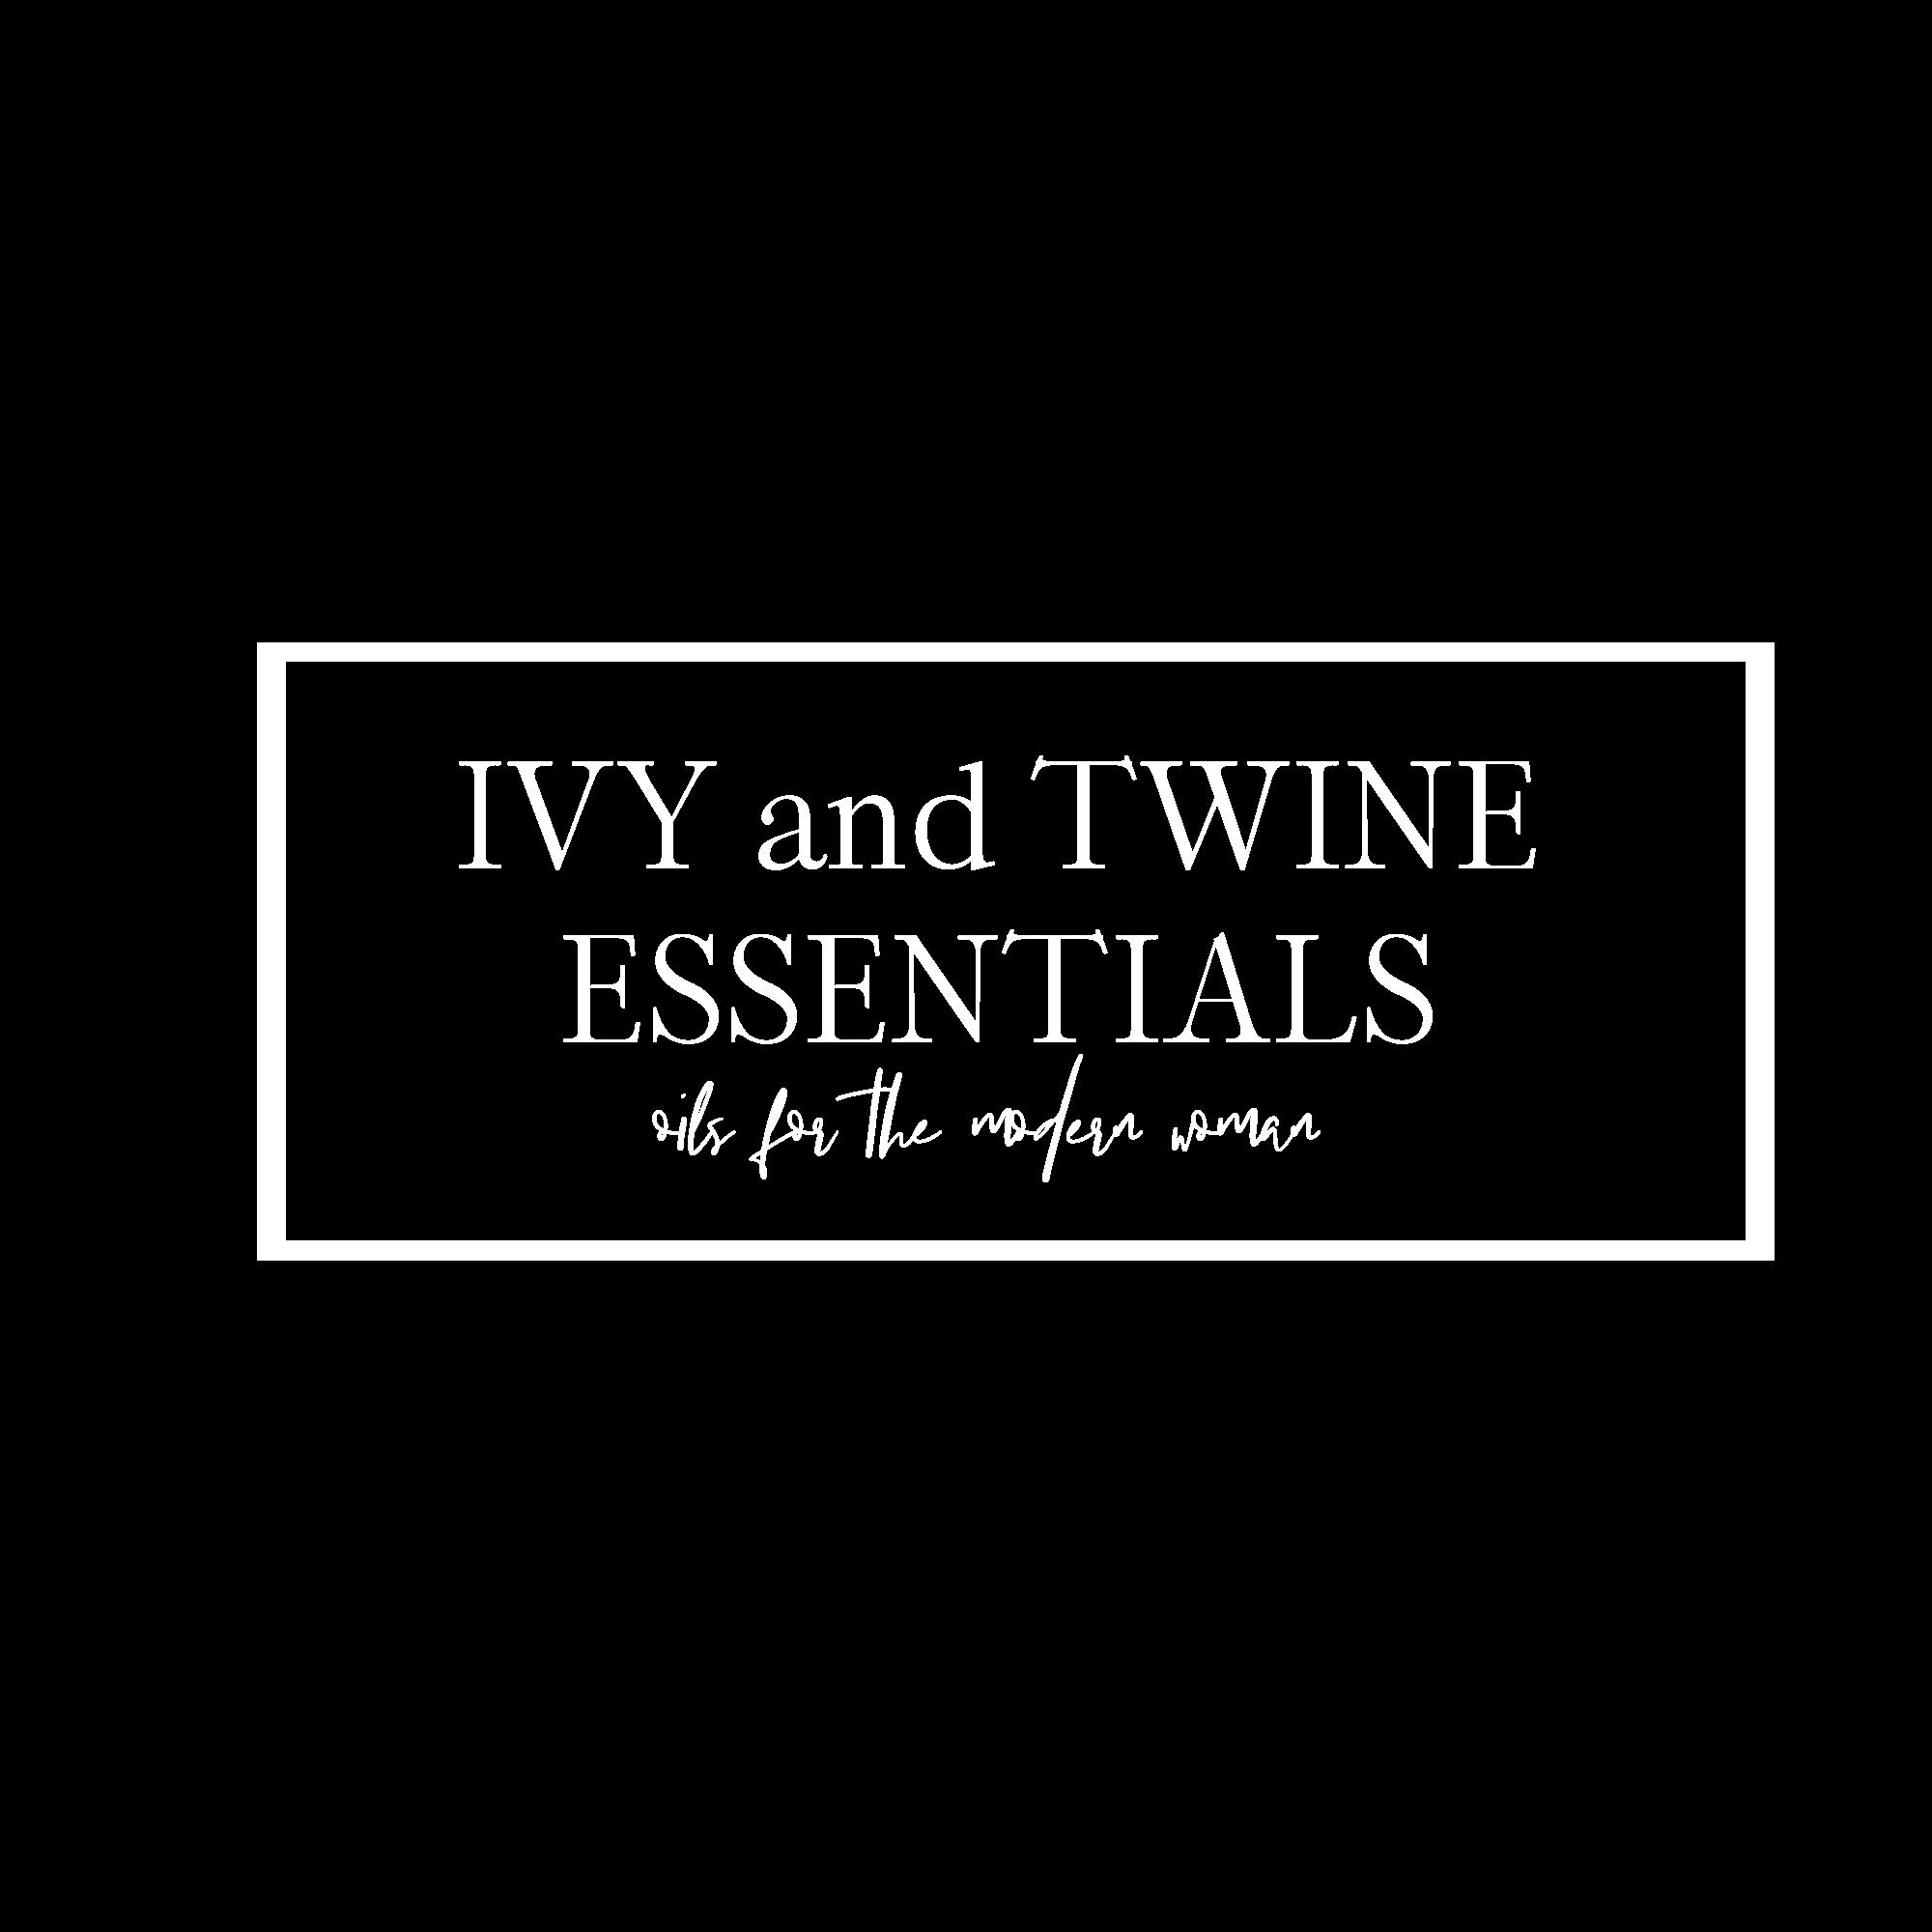 ivyandtwine-logo-2.png